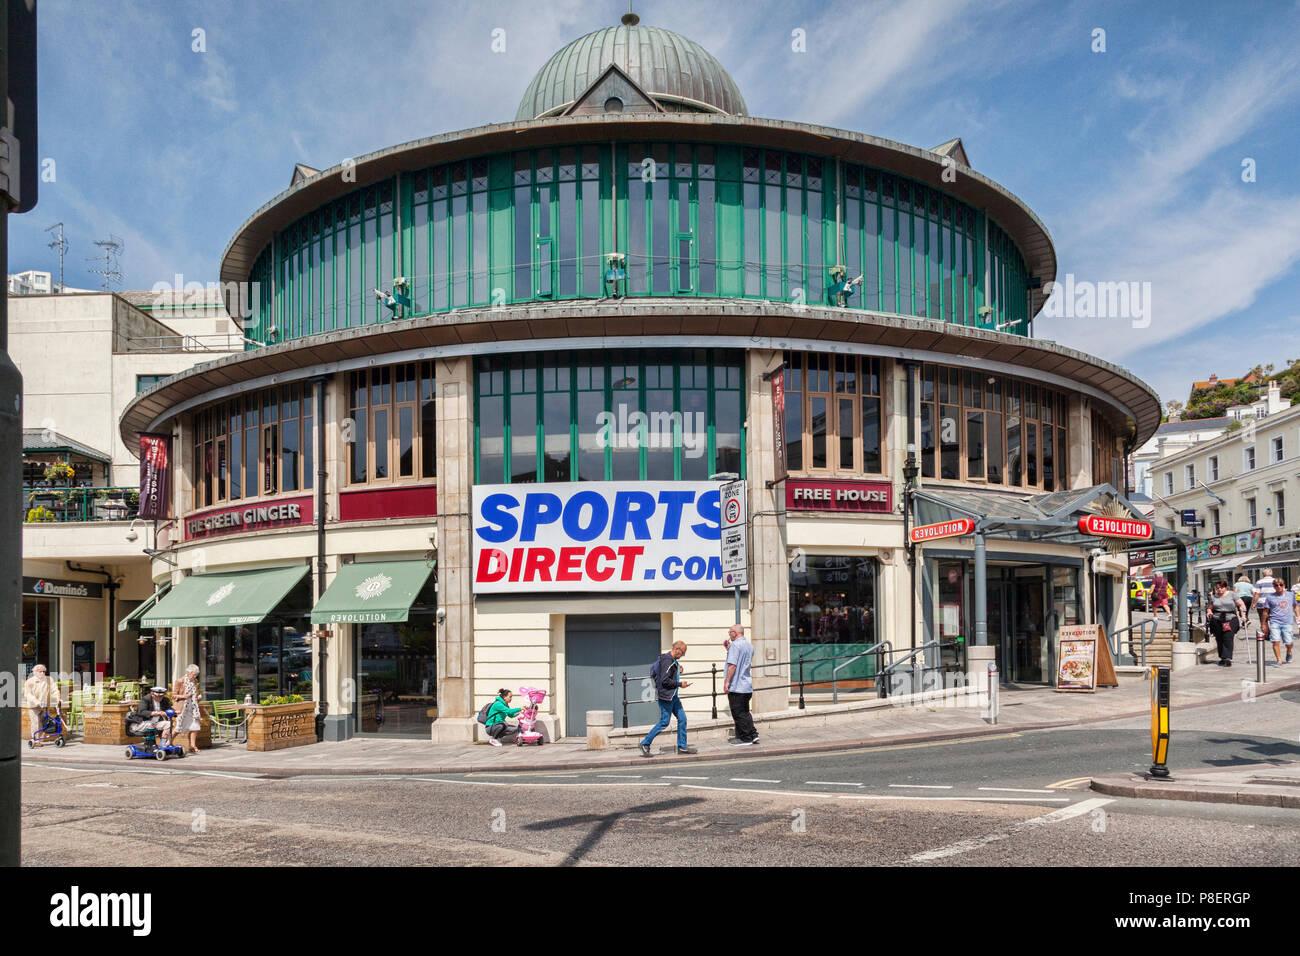 21 May 2018: Torquay, Devon, UK - Sports Direct, Winter Gardens Shopping Centre, Fleet, Street. - Stock Image